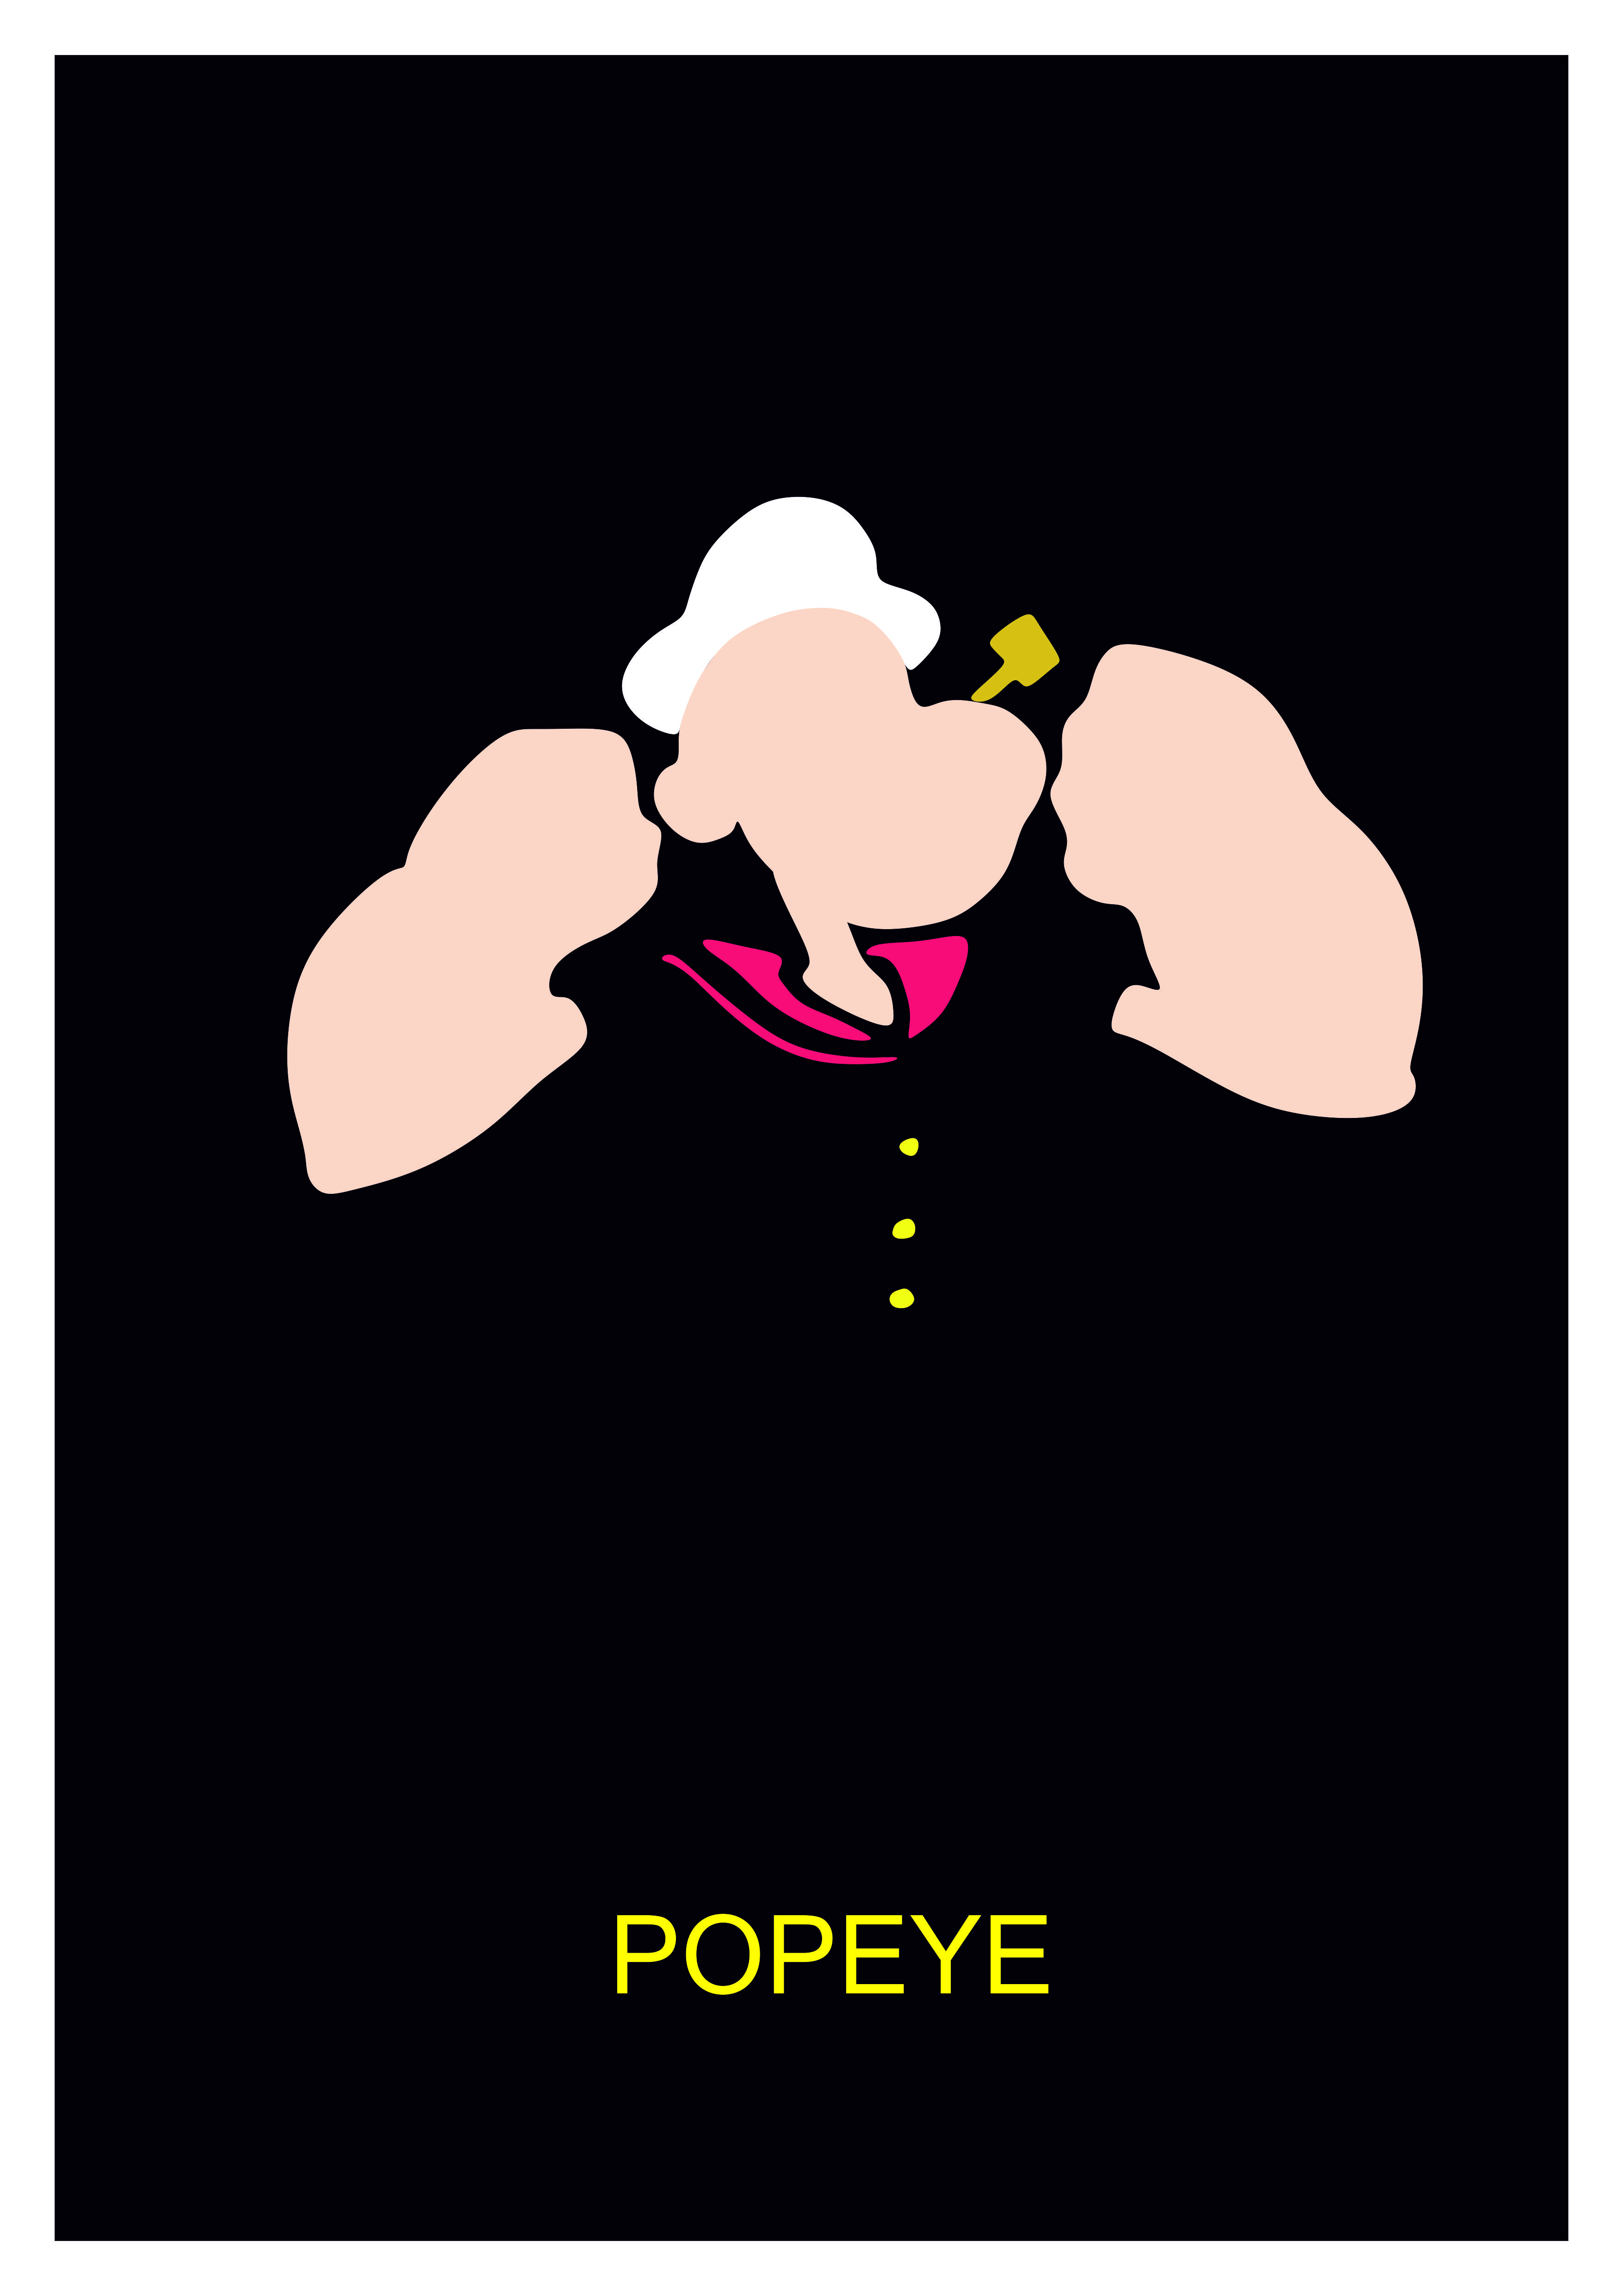 Popeye. Desierto Studios (Óscar Sola) Whatsapp profile